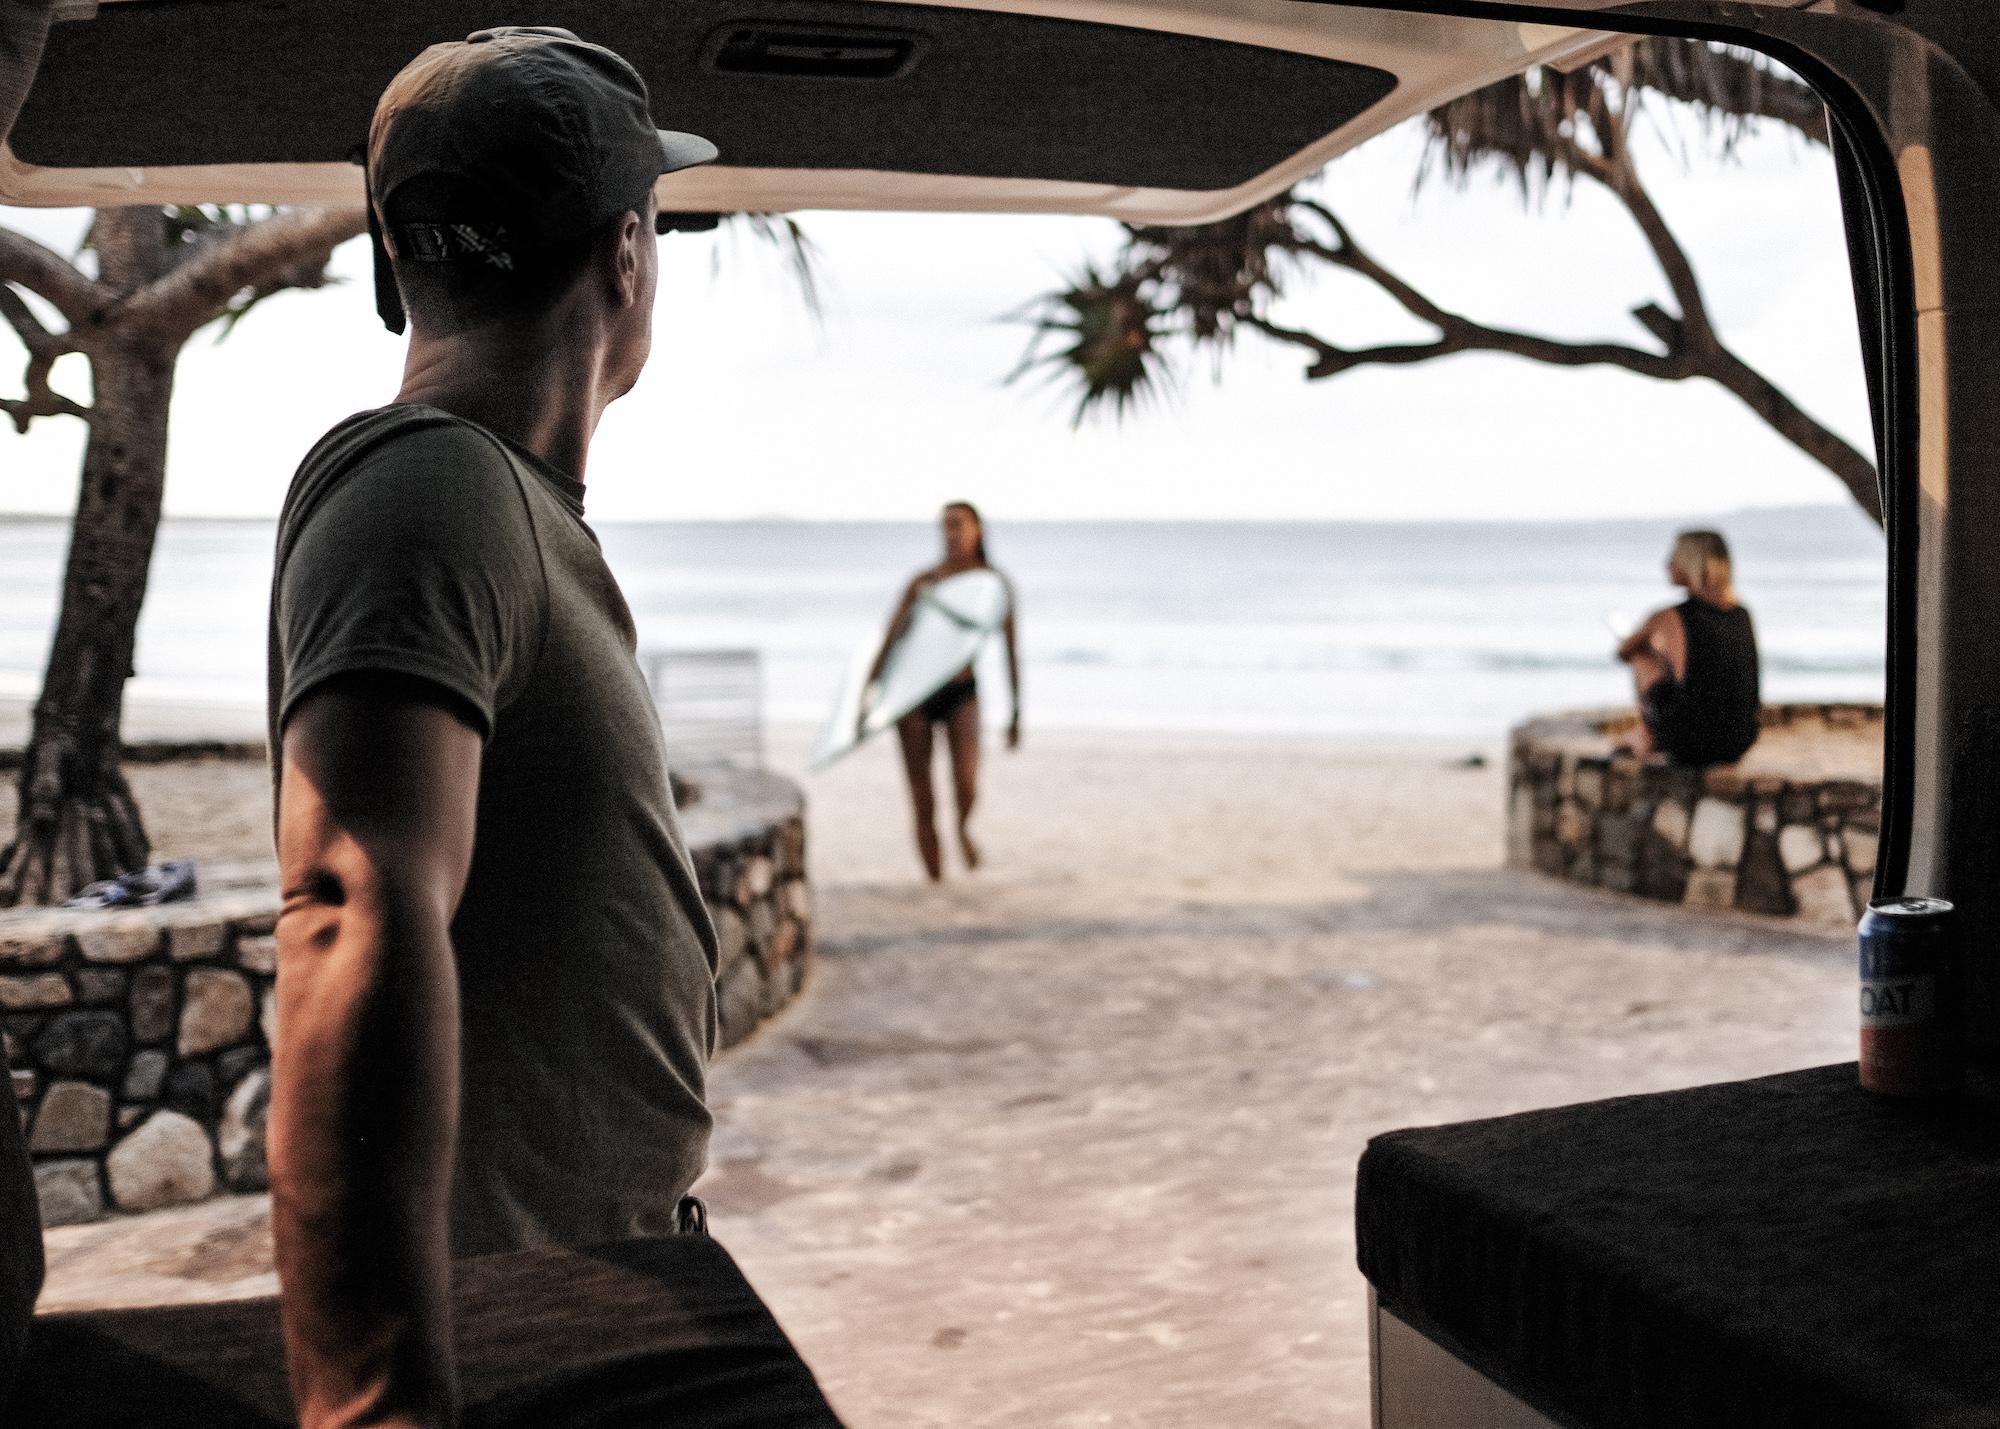 Surf trip en van aménagé